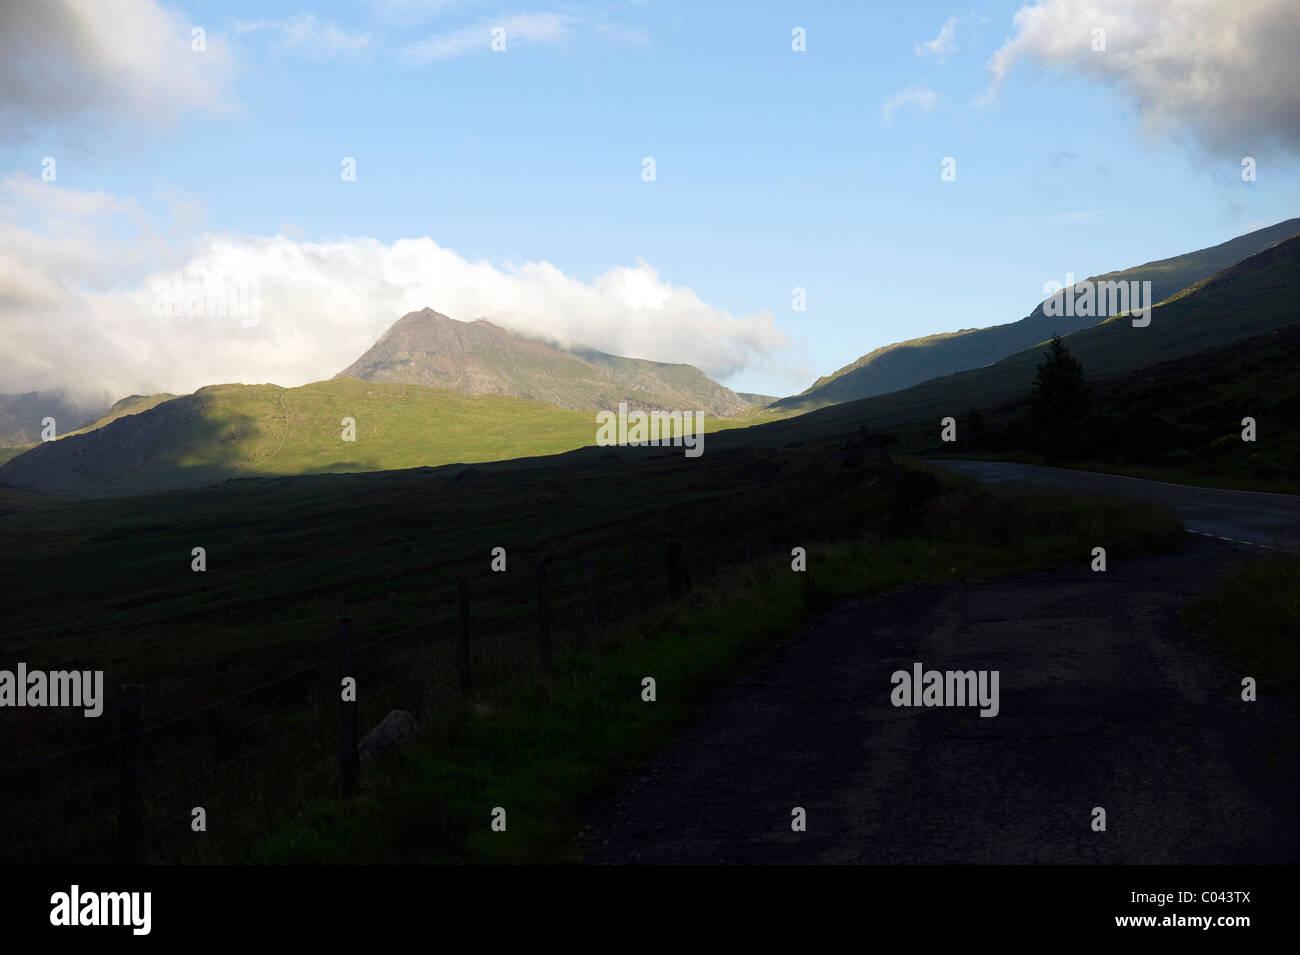 View of Snowdon Massif, Yr Wyddfa from A4086 near Capel Curig Stock Photo